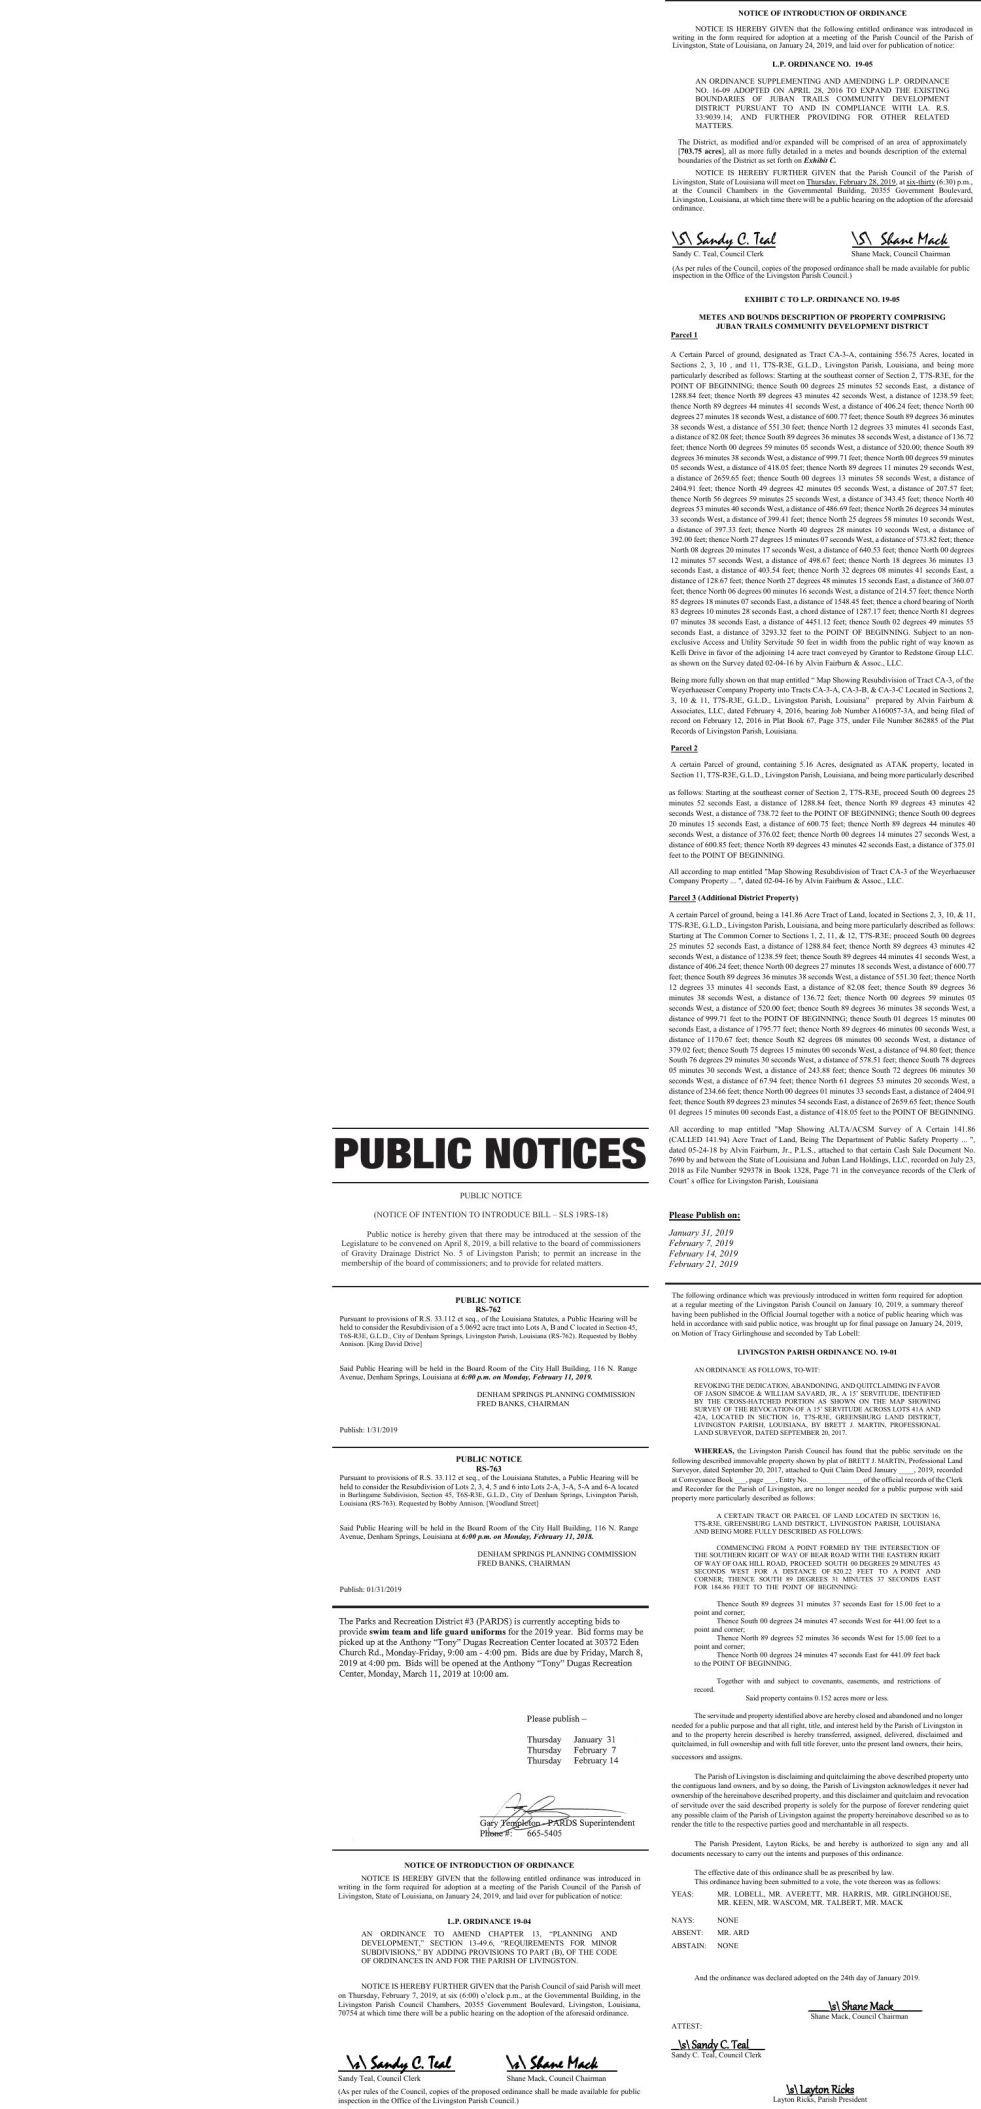 Public Notices published January 31, 2019